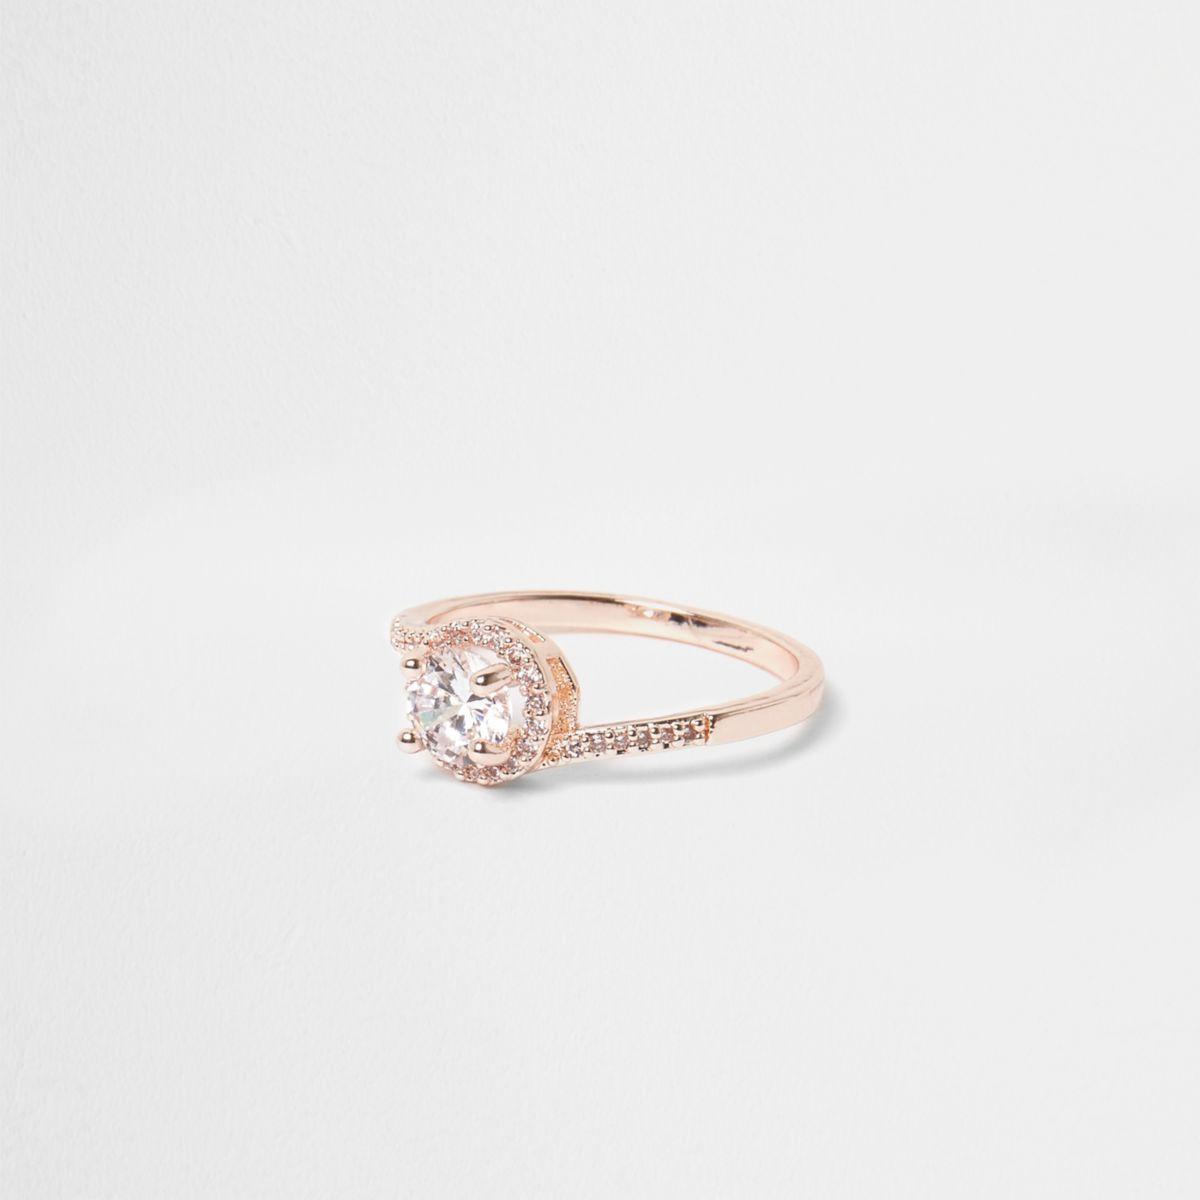 Rose gold tone rhinestone pave ring